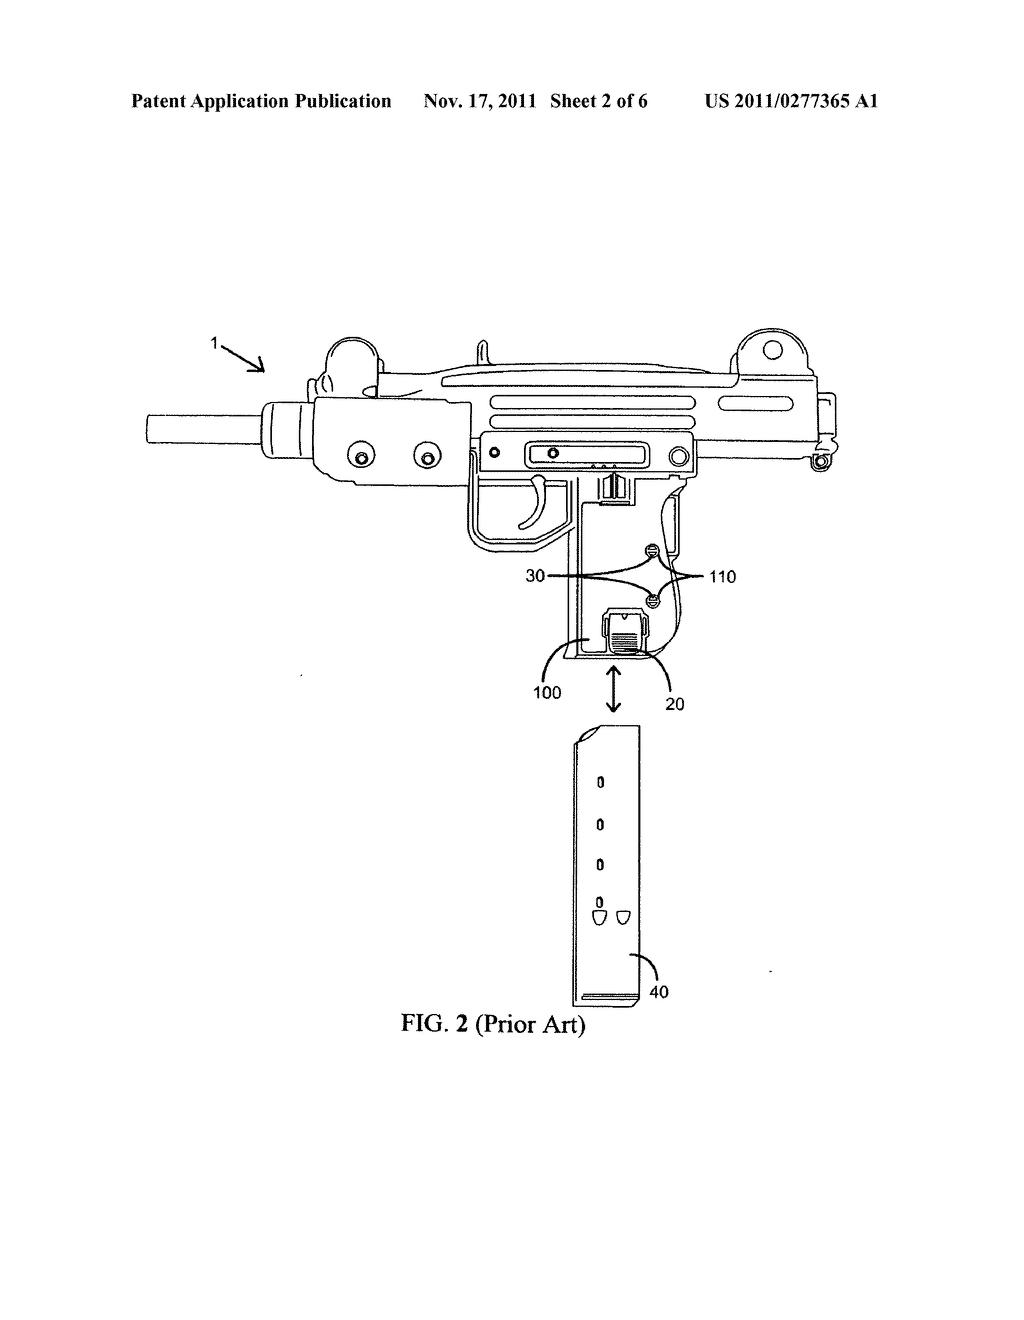 detachable magazine lock grip for uzi firearm diagram imi uzi diagram uzi schematic #6